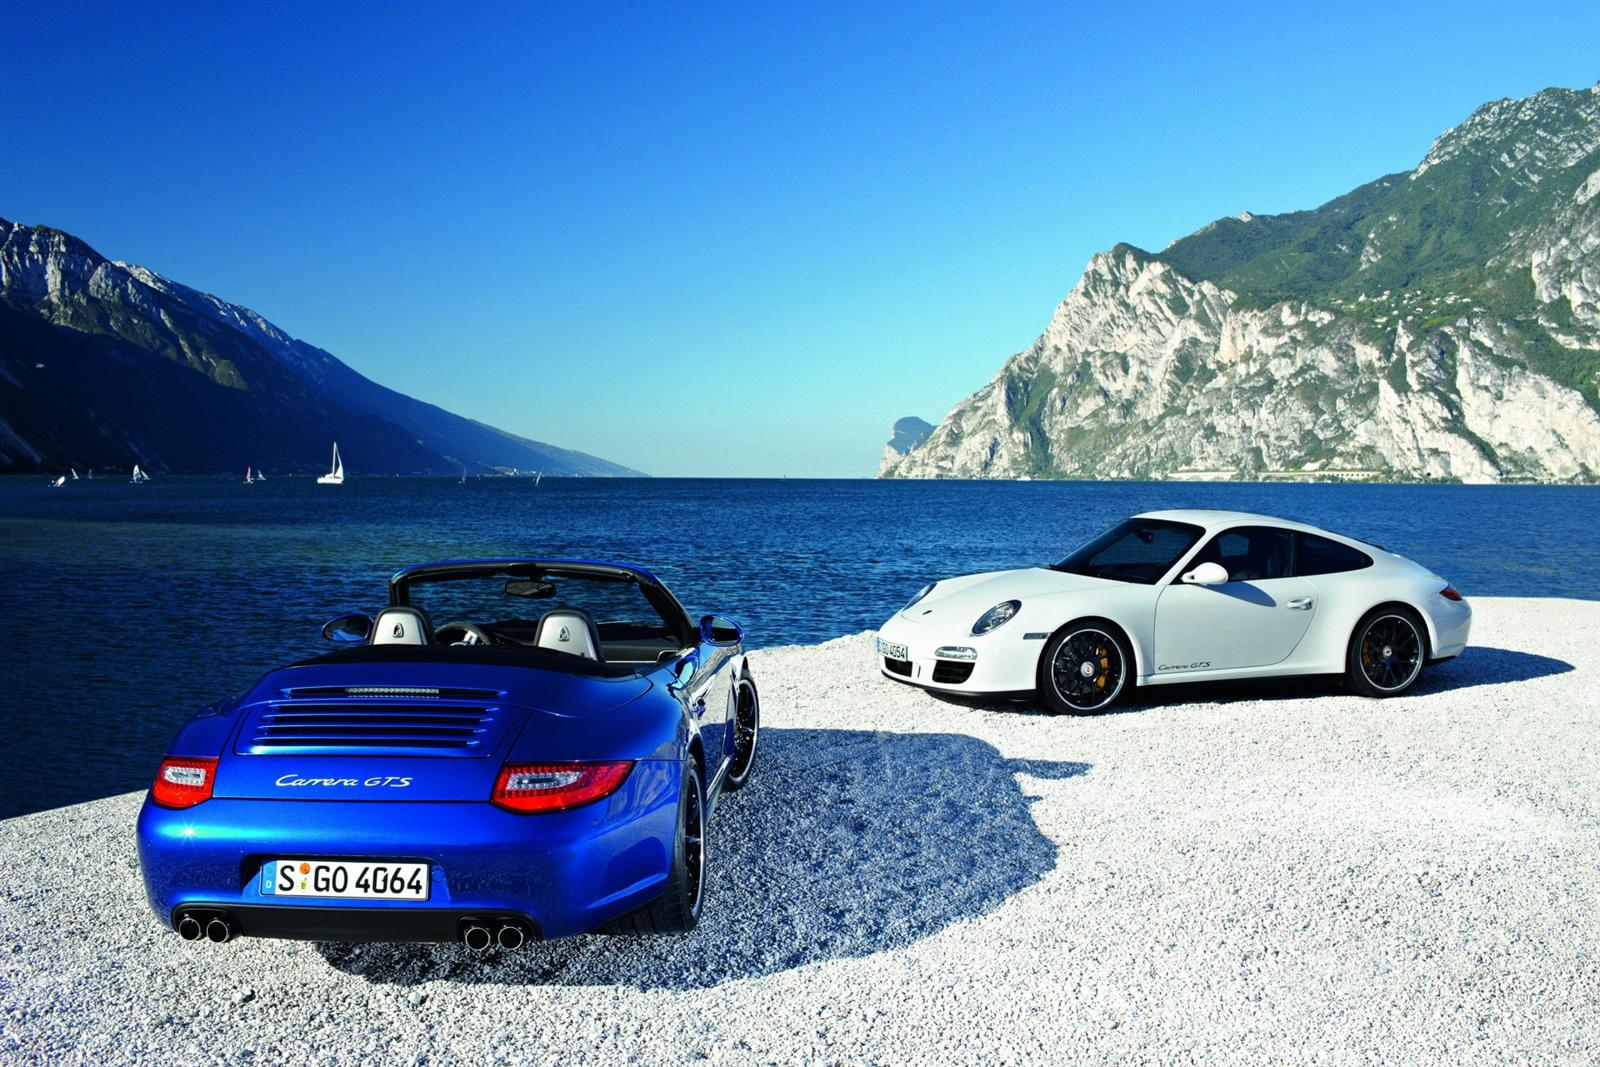 2011 Porsche 911 Carrera GTS Image